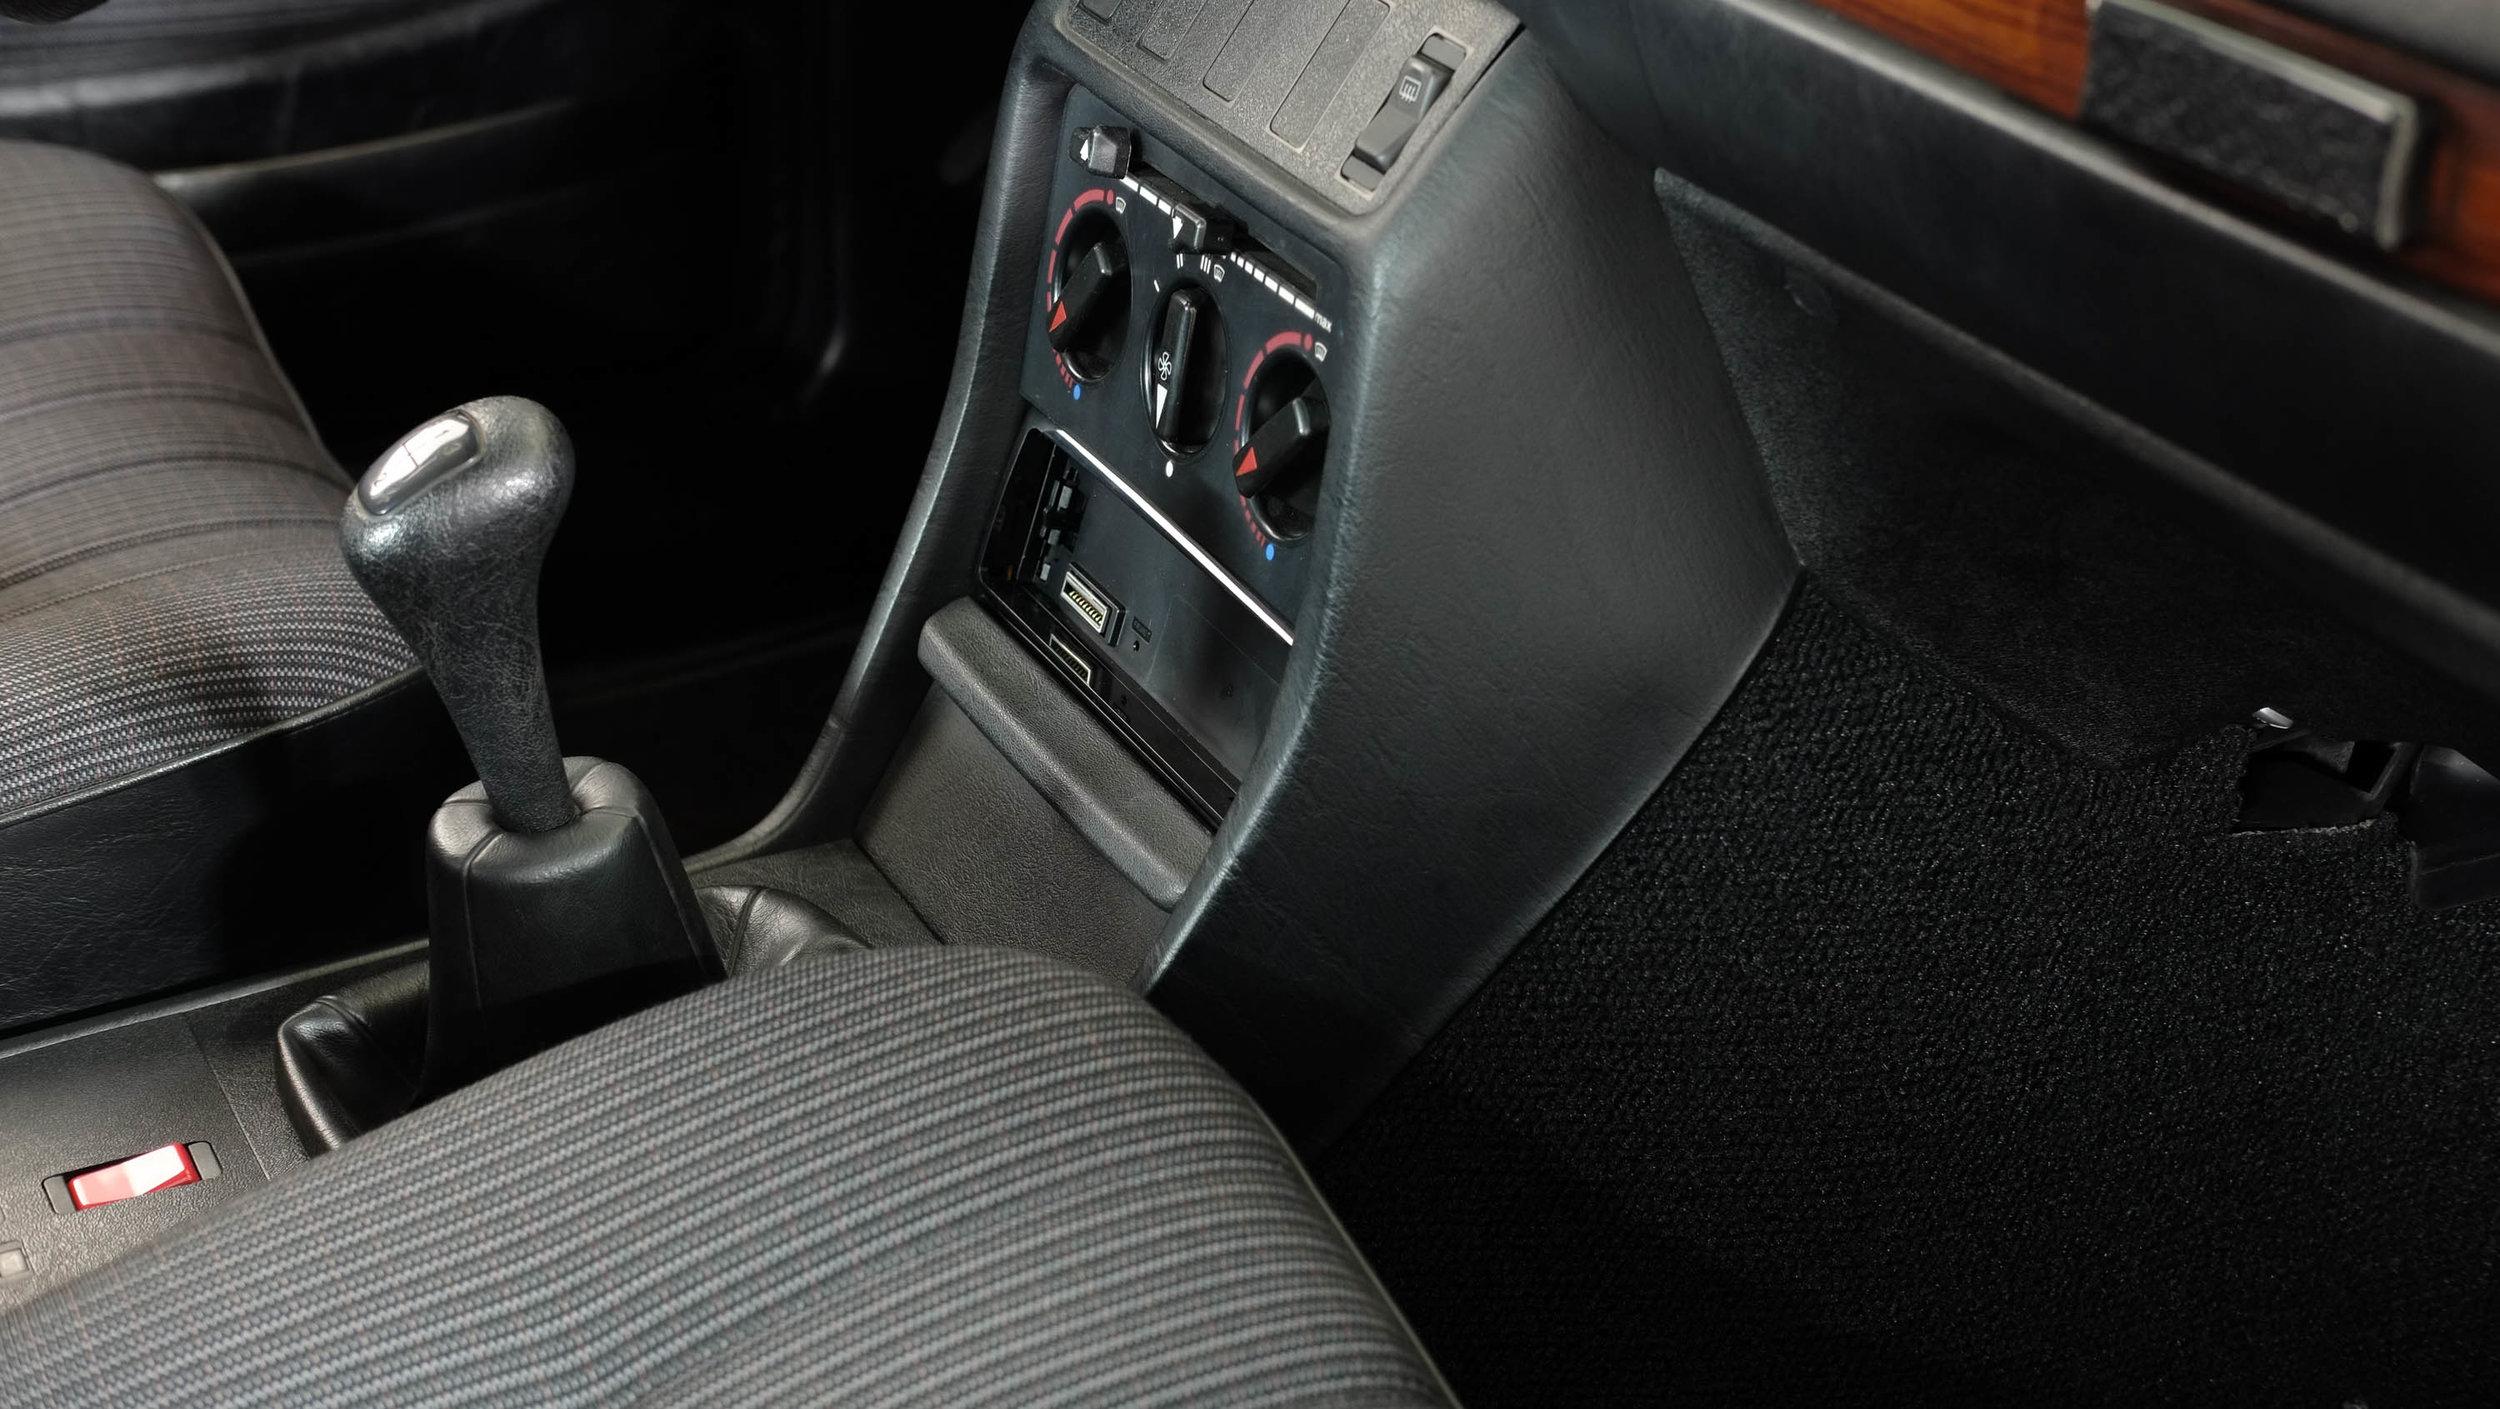 coolnvintage Mercedes-Benz W123 300D (33 of 59).jpg